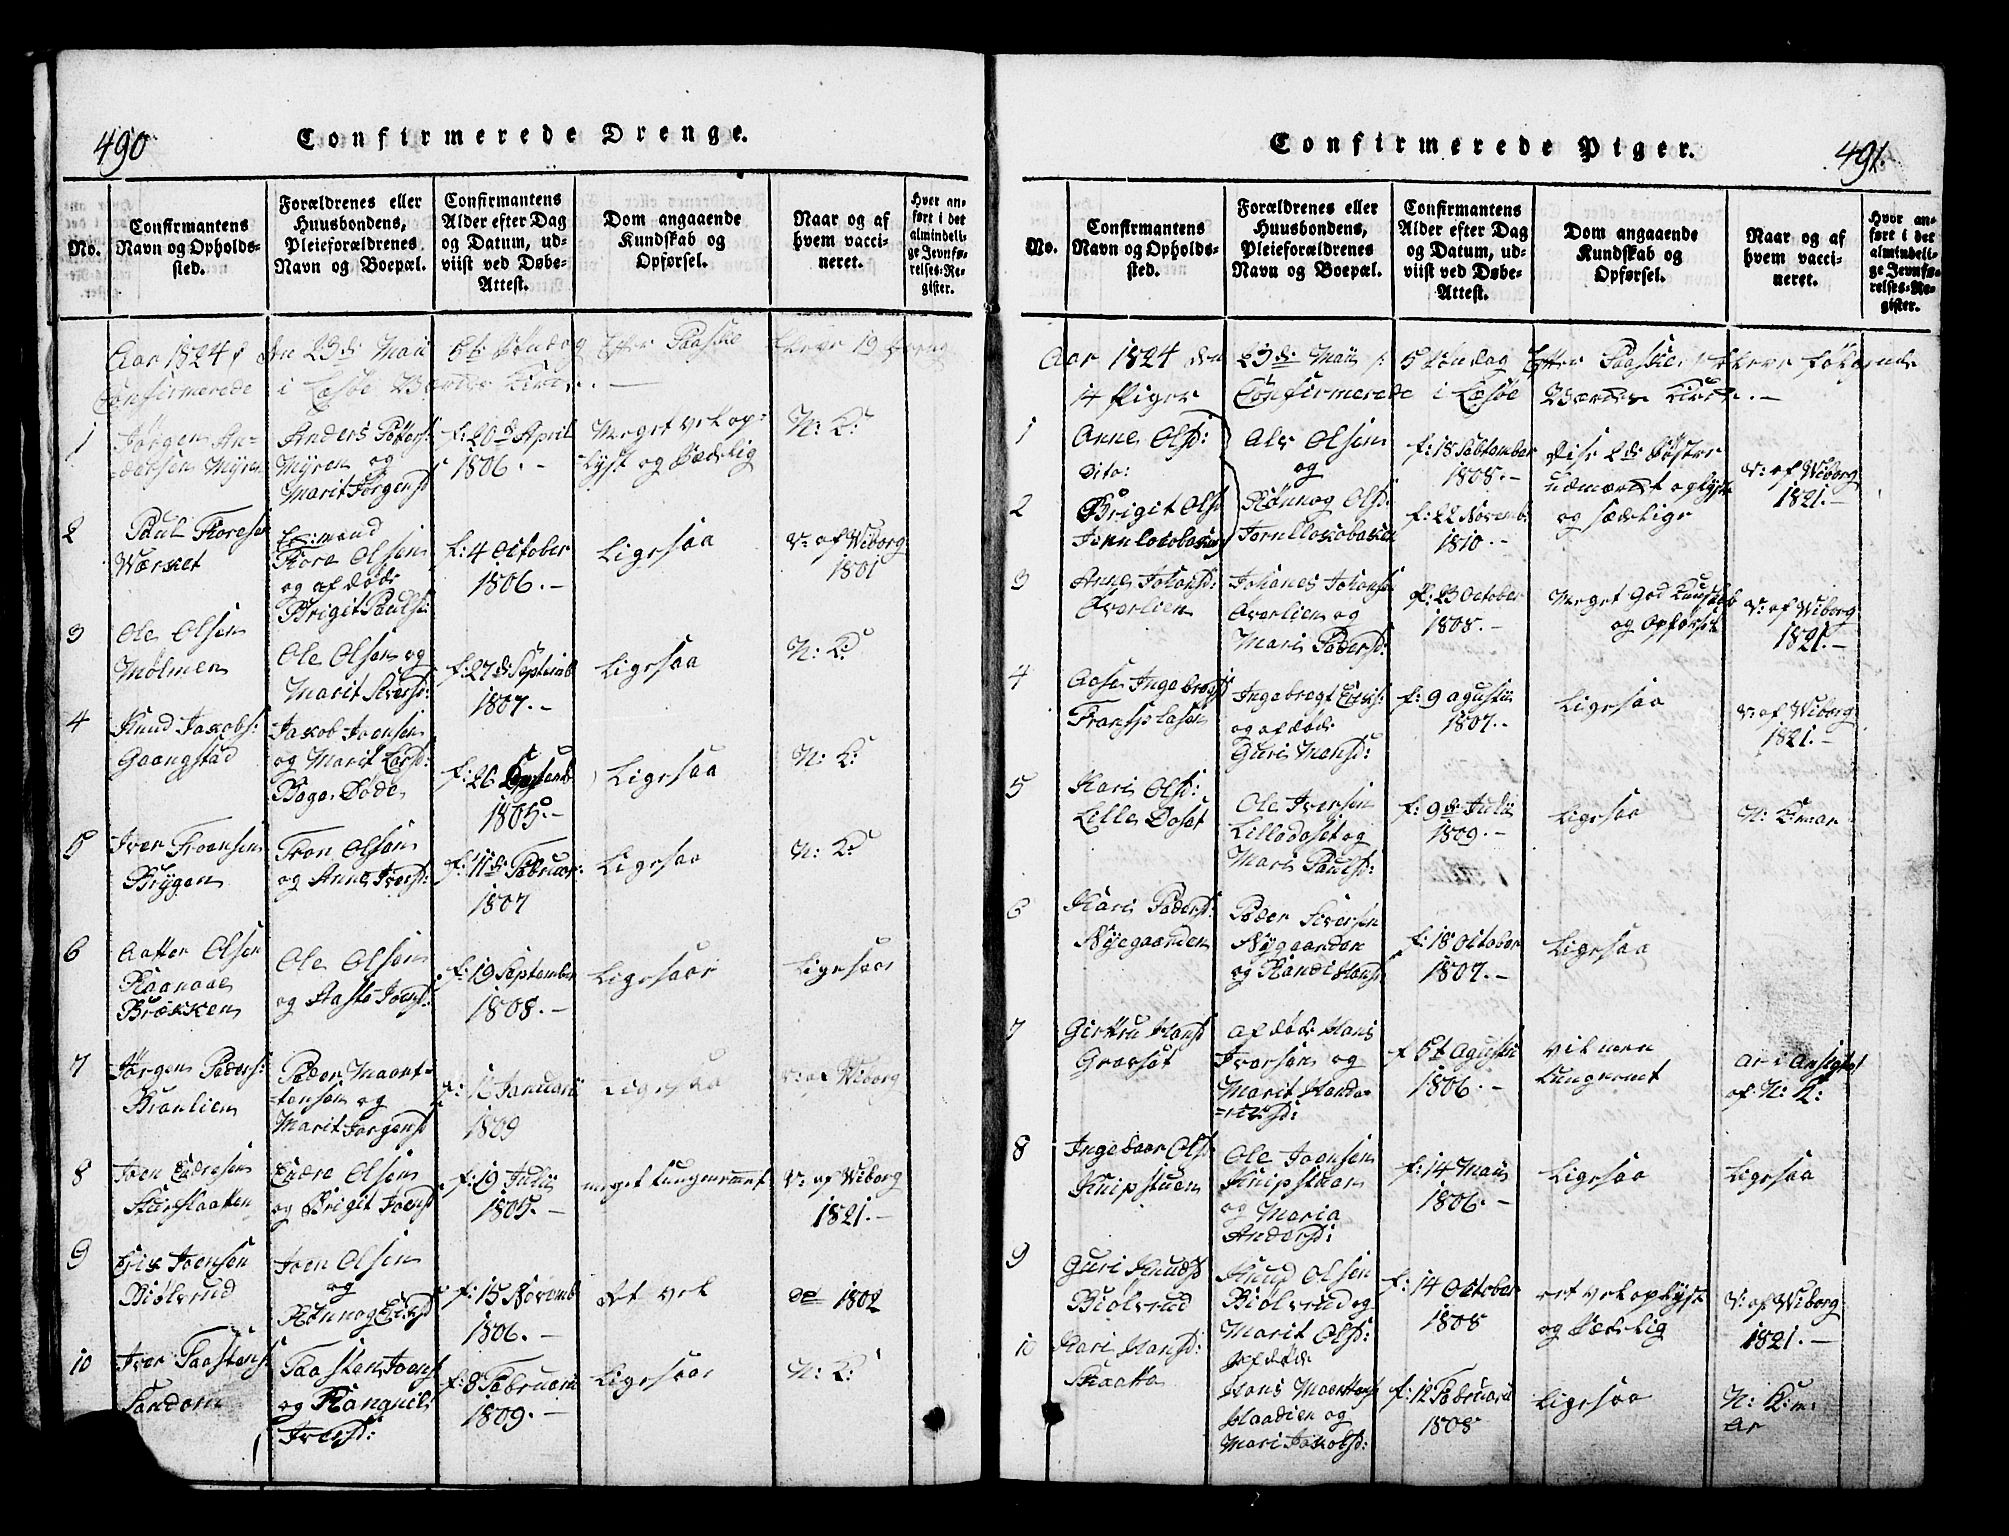 SAH, Lesja prestekontor, Klokkerbok nr. 1, 1820-1831, s. 490-491